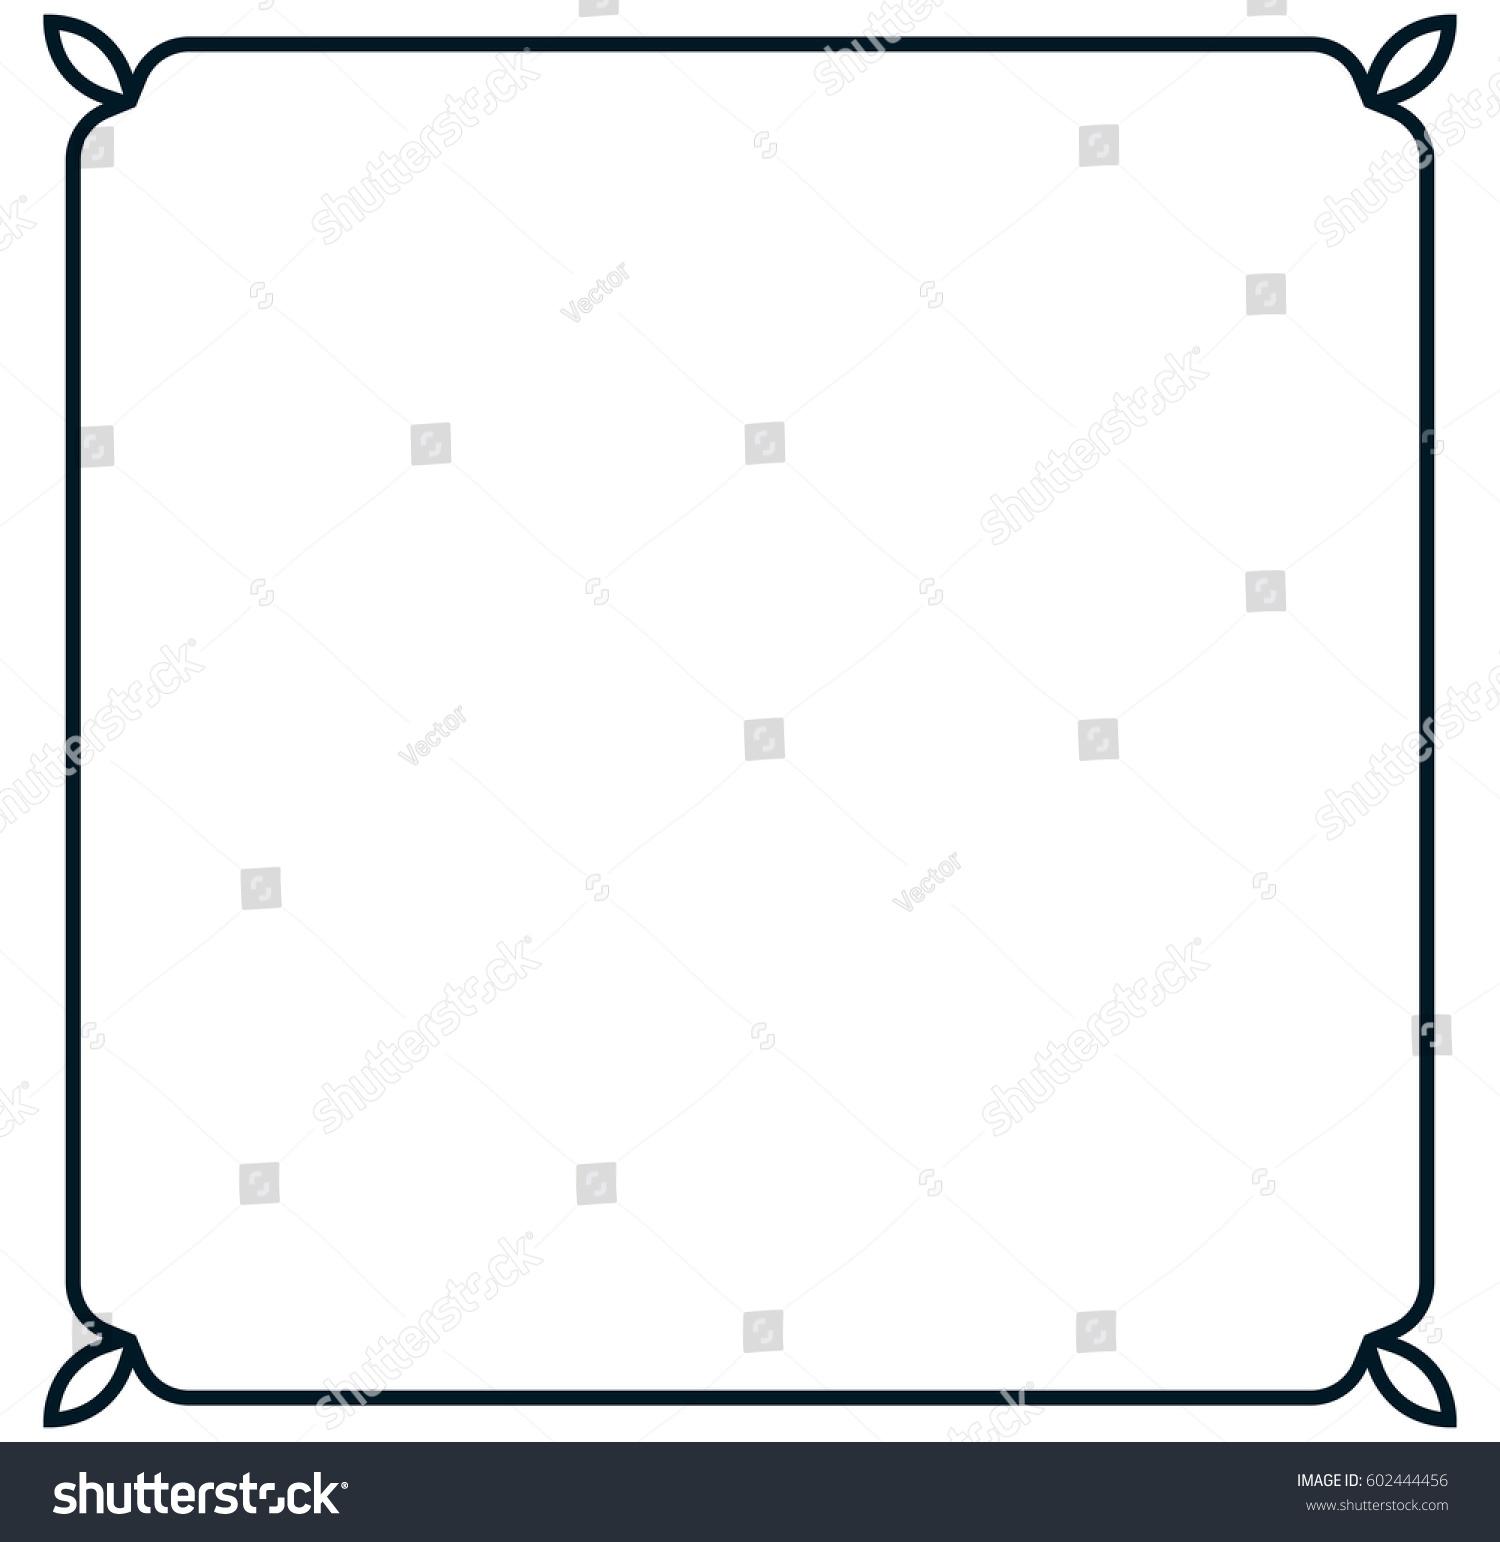 royalty free square frame border vector vintage 602444456 stock rh avopix com vintage banner vector png vintage banner vector free download